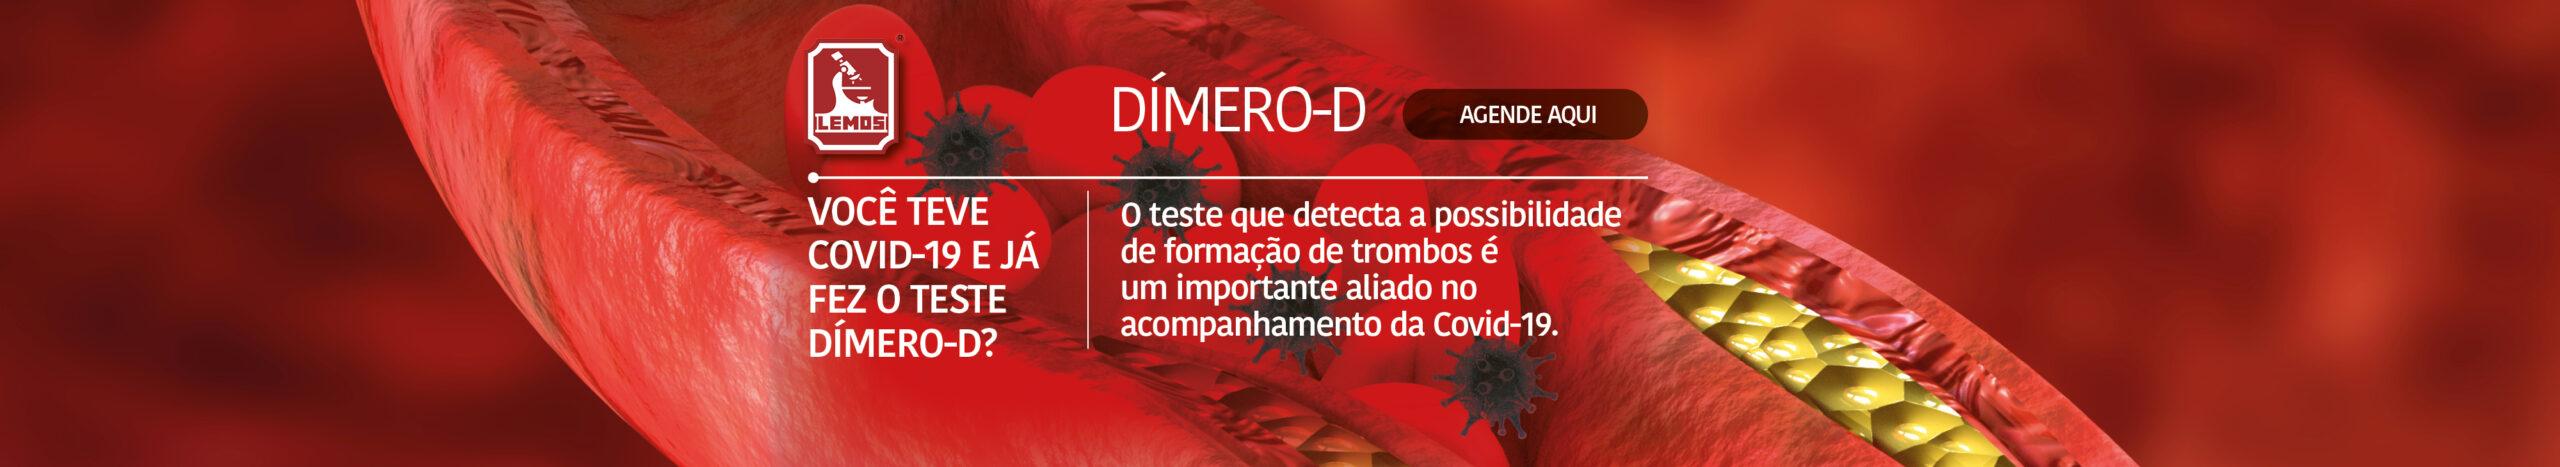 Dimero-D